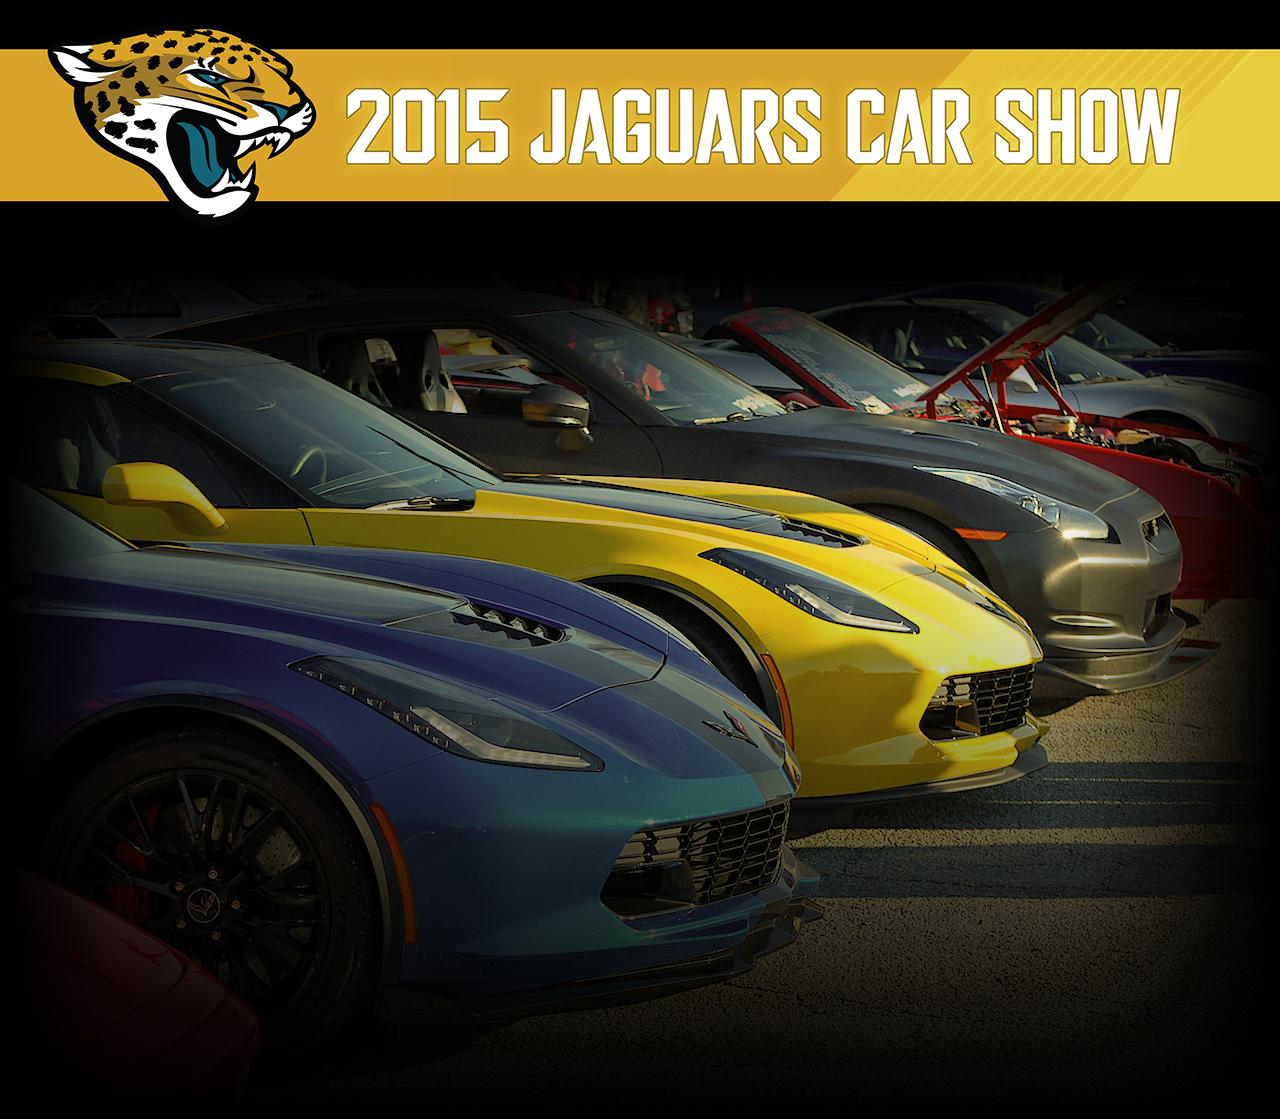 news recall jaguars cars articles jaguar alert com img xf car